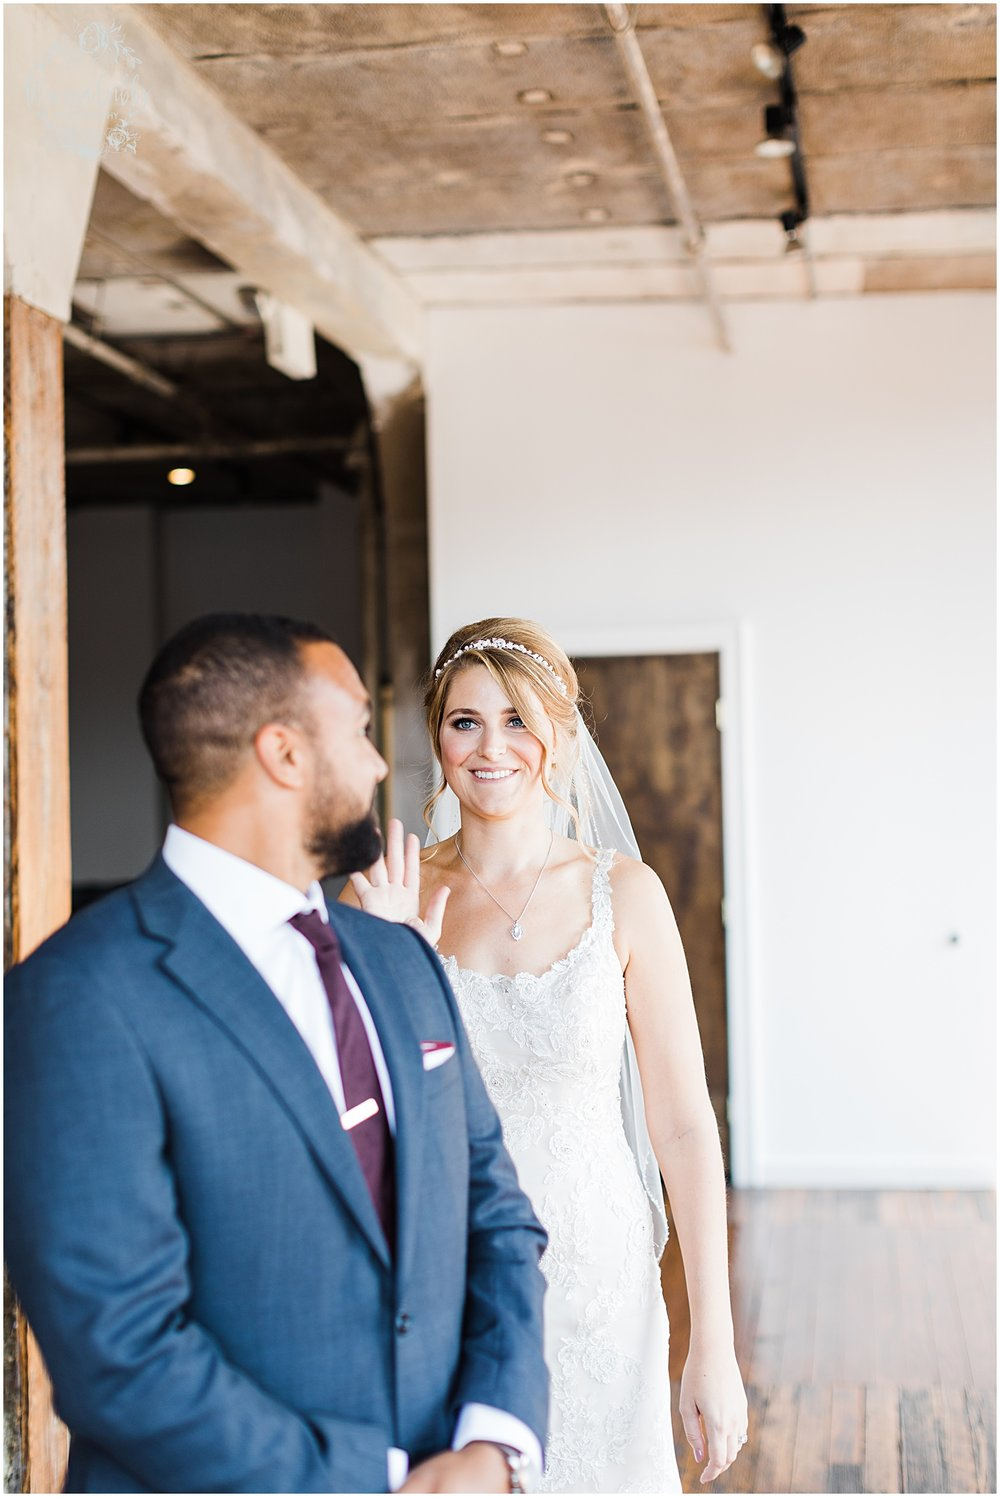 BAUER WEDDING | KELSEA & JUSTIN | MARISSA CRIBBS PHOTOGRAPHY_6503.jpg